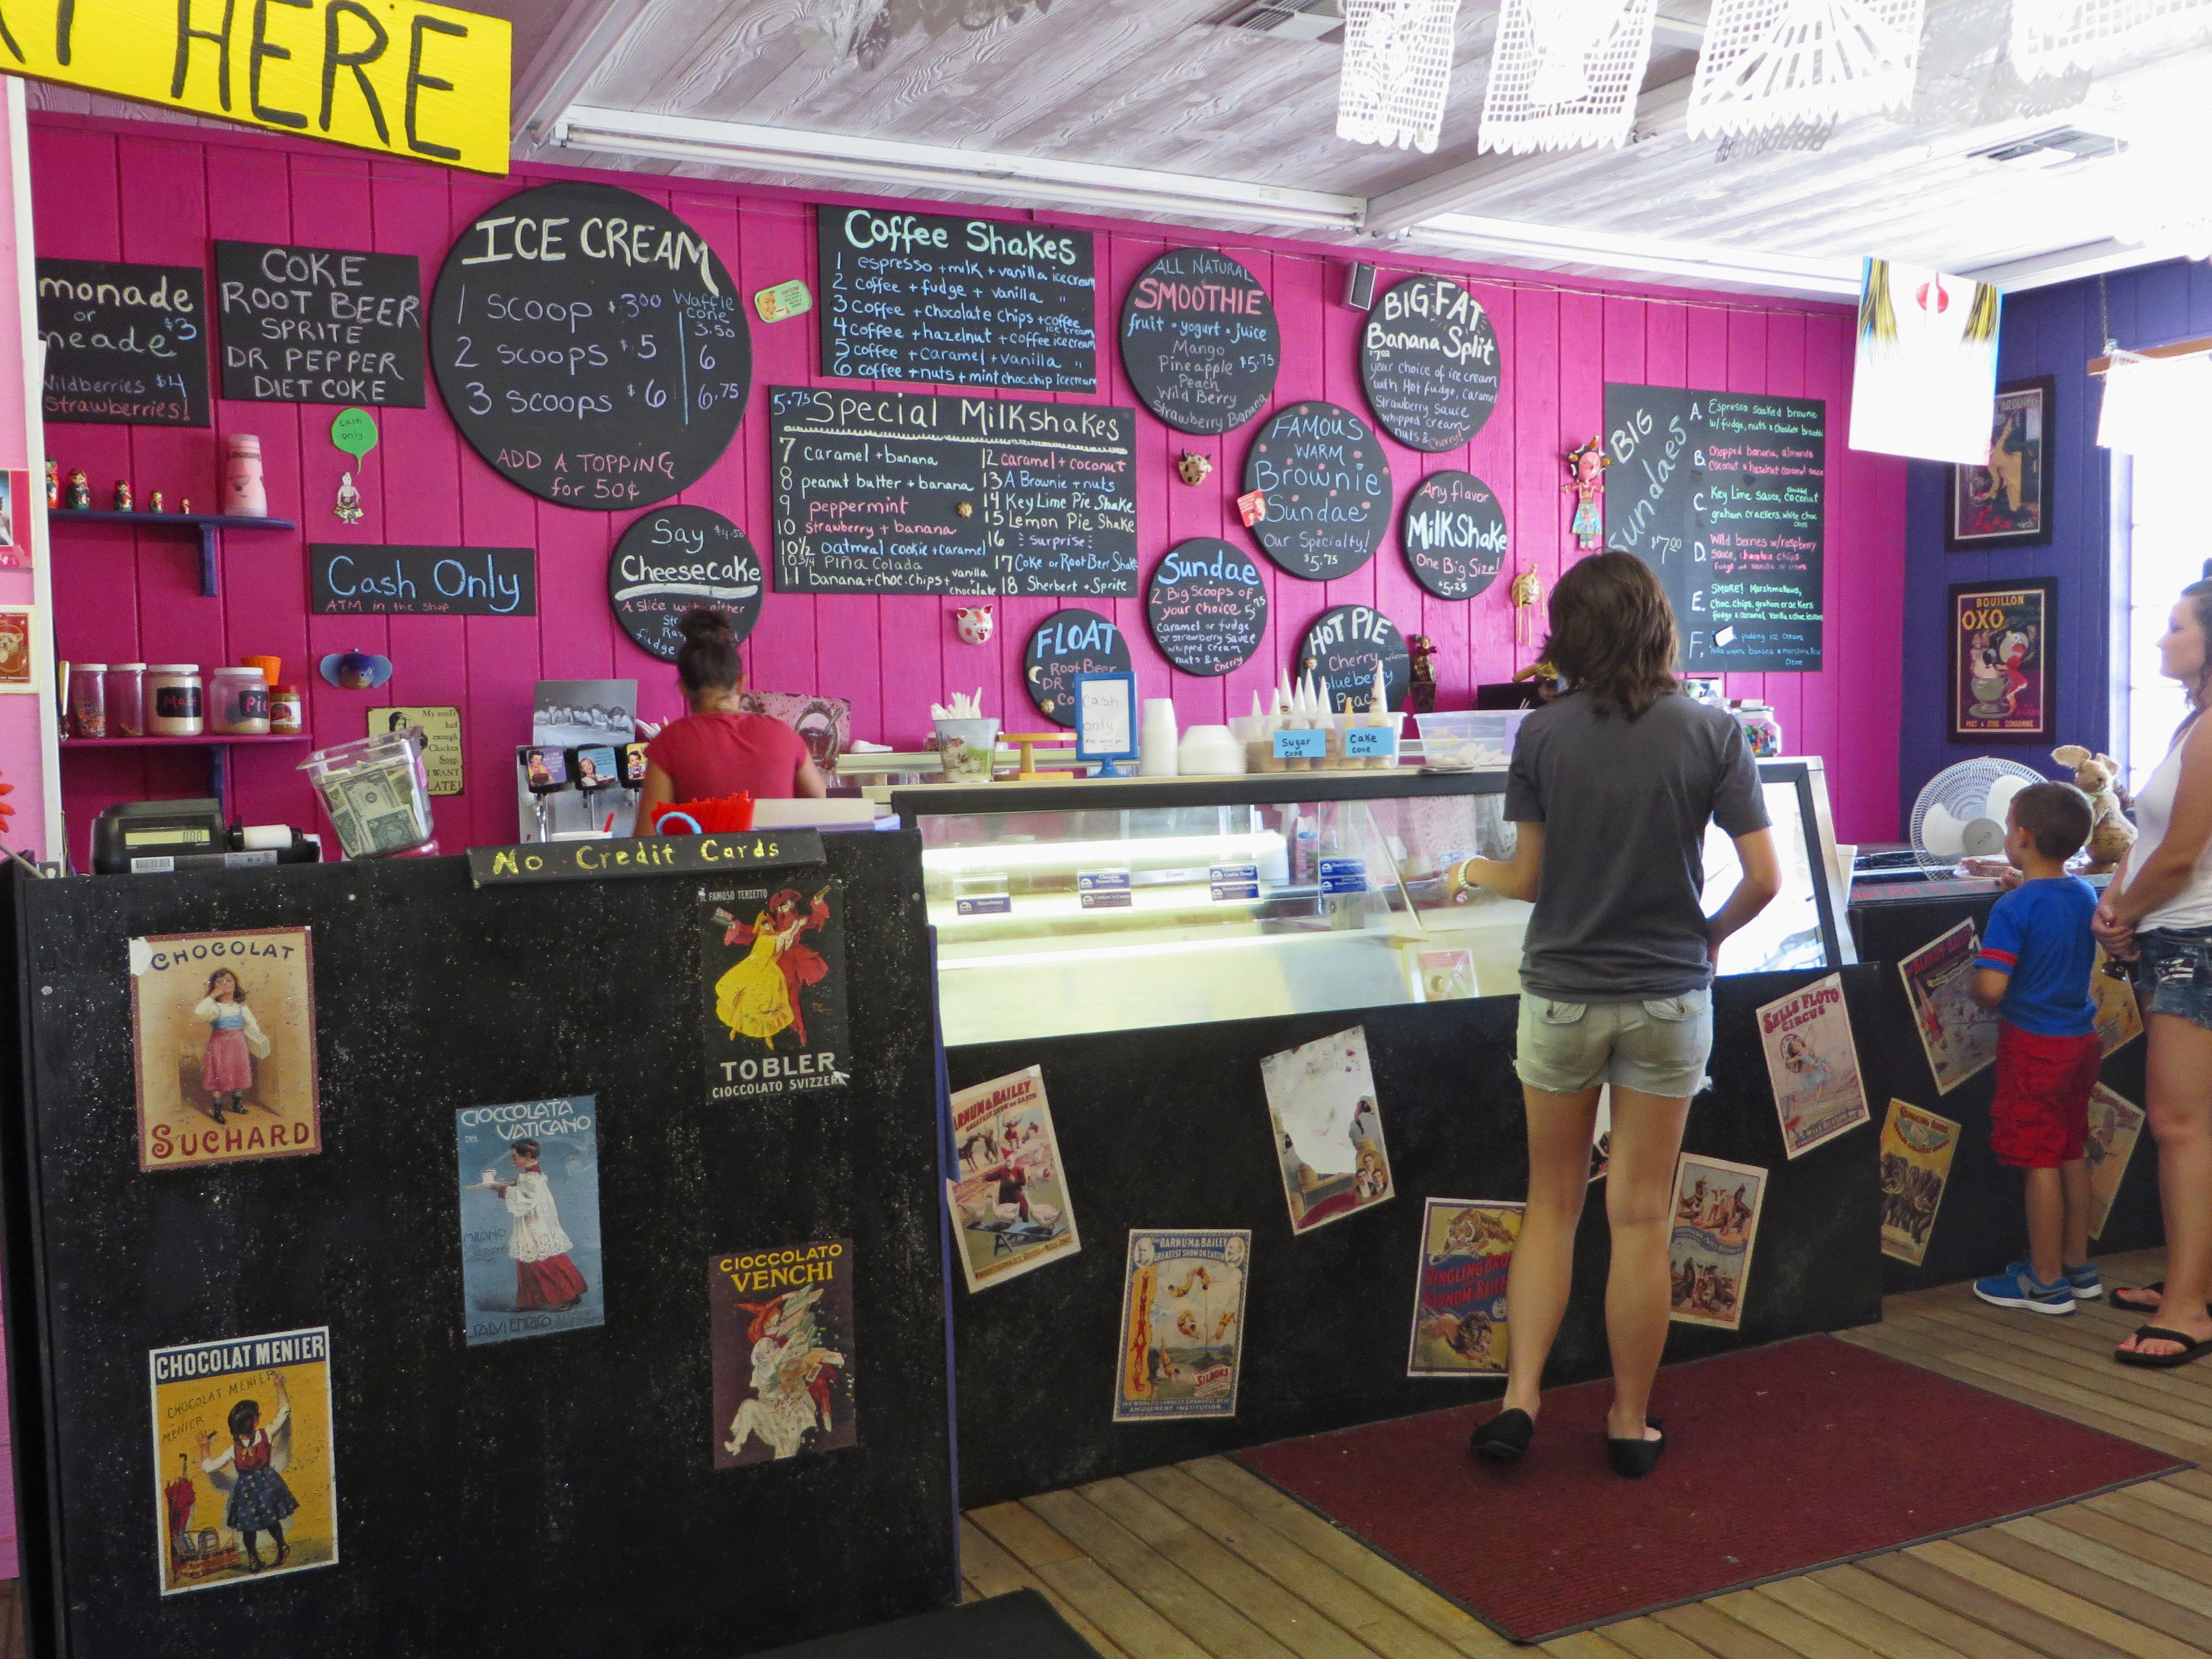 Marvelous Ice Cream Shop Counter Google Search Ice Cream Shop Download Free Architecture Designs Scobabritishbridgeorg